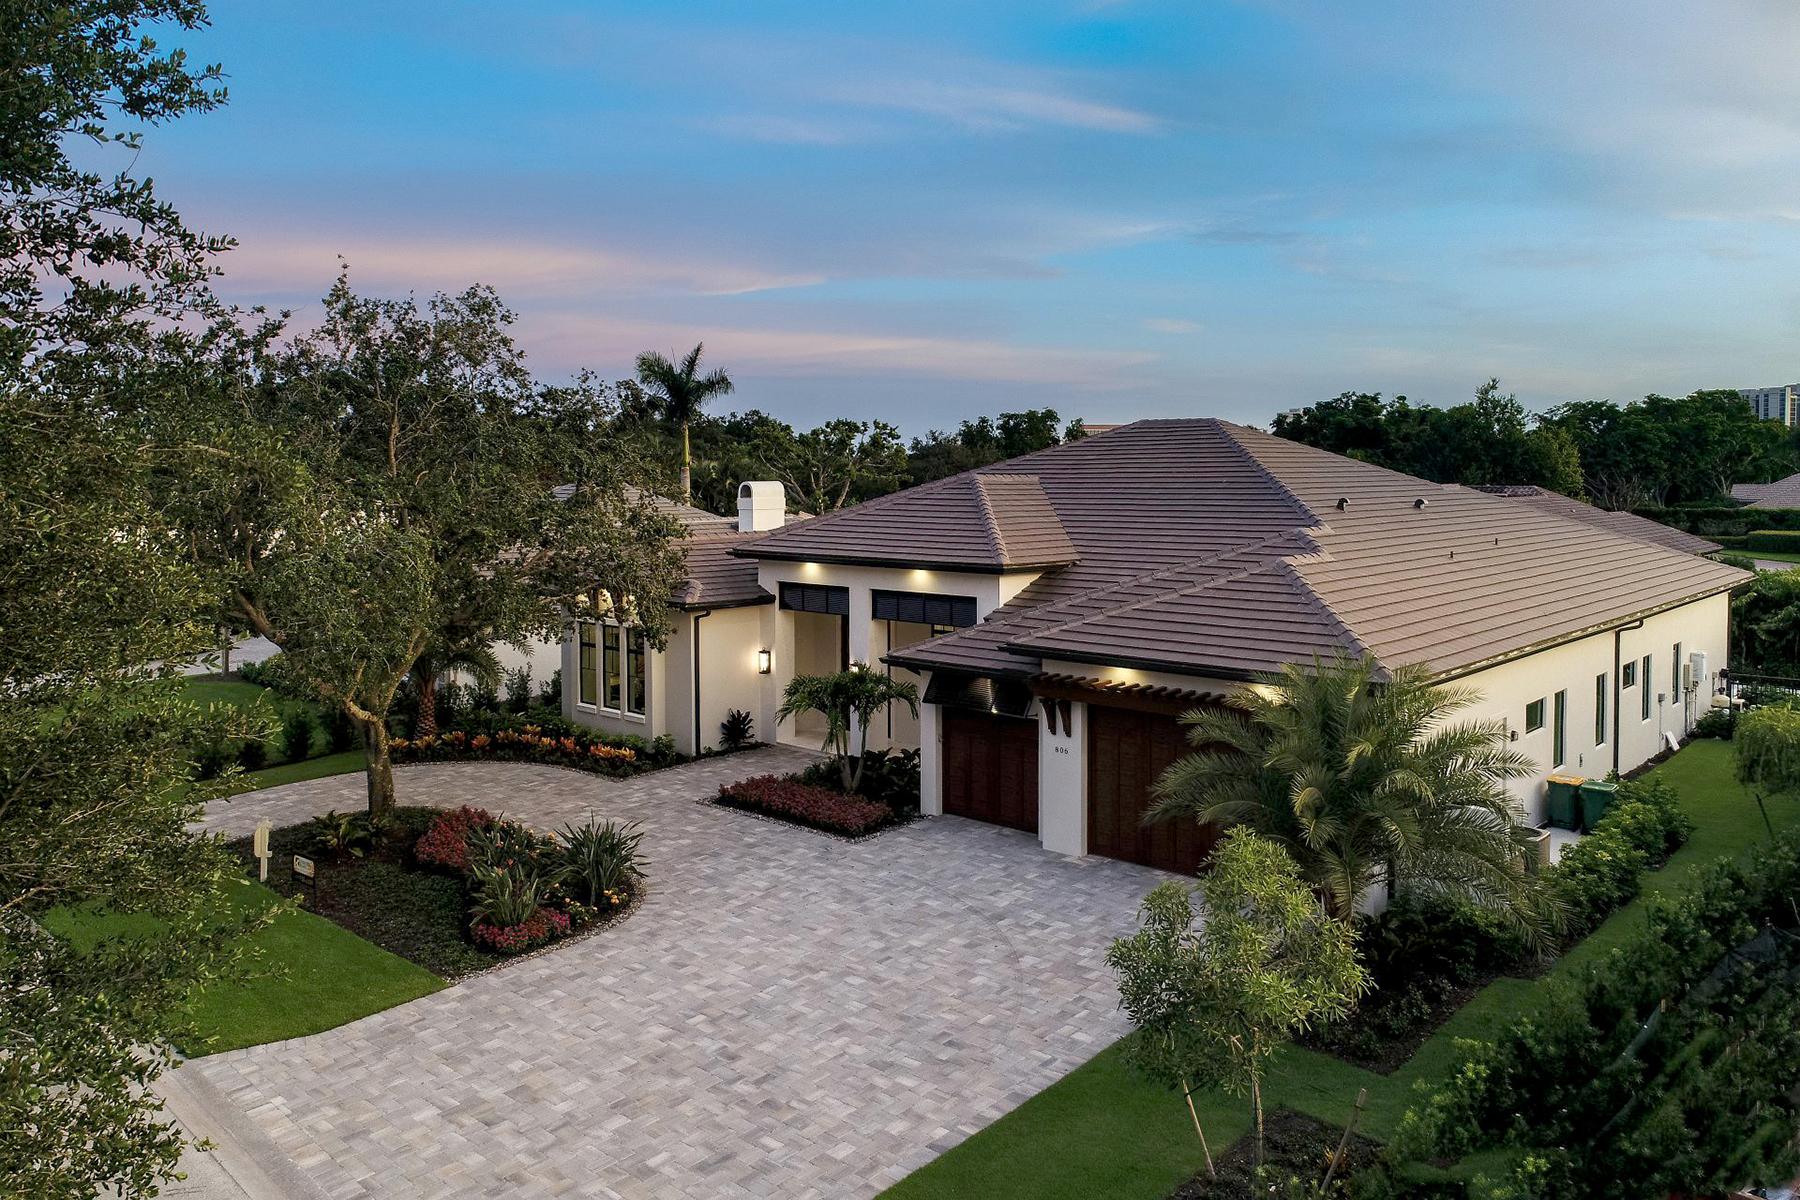 獨棟家庭住宅 為 出售 在 Pinecrest at Pelican Bay 806 Tallow Tree Ct Naples, 佛羅里達州 34108 美國